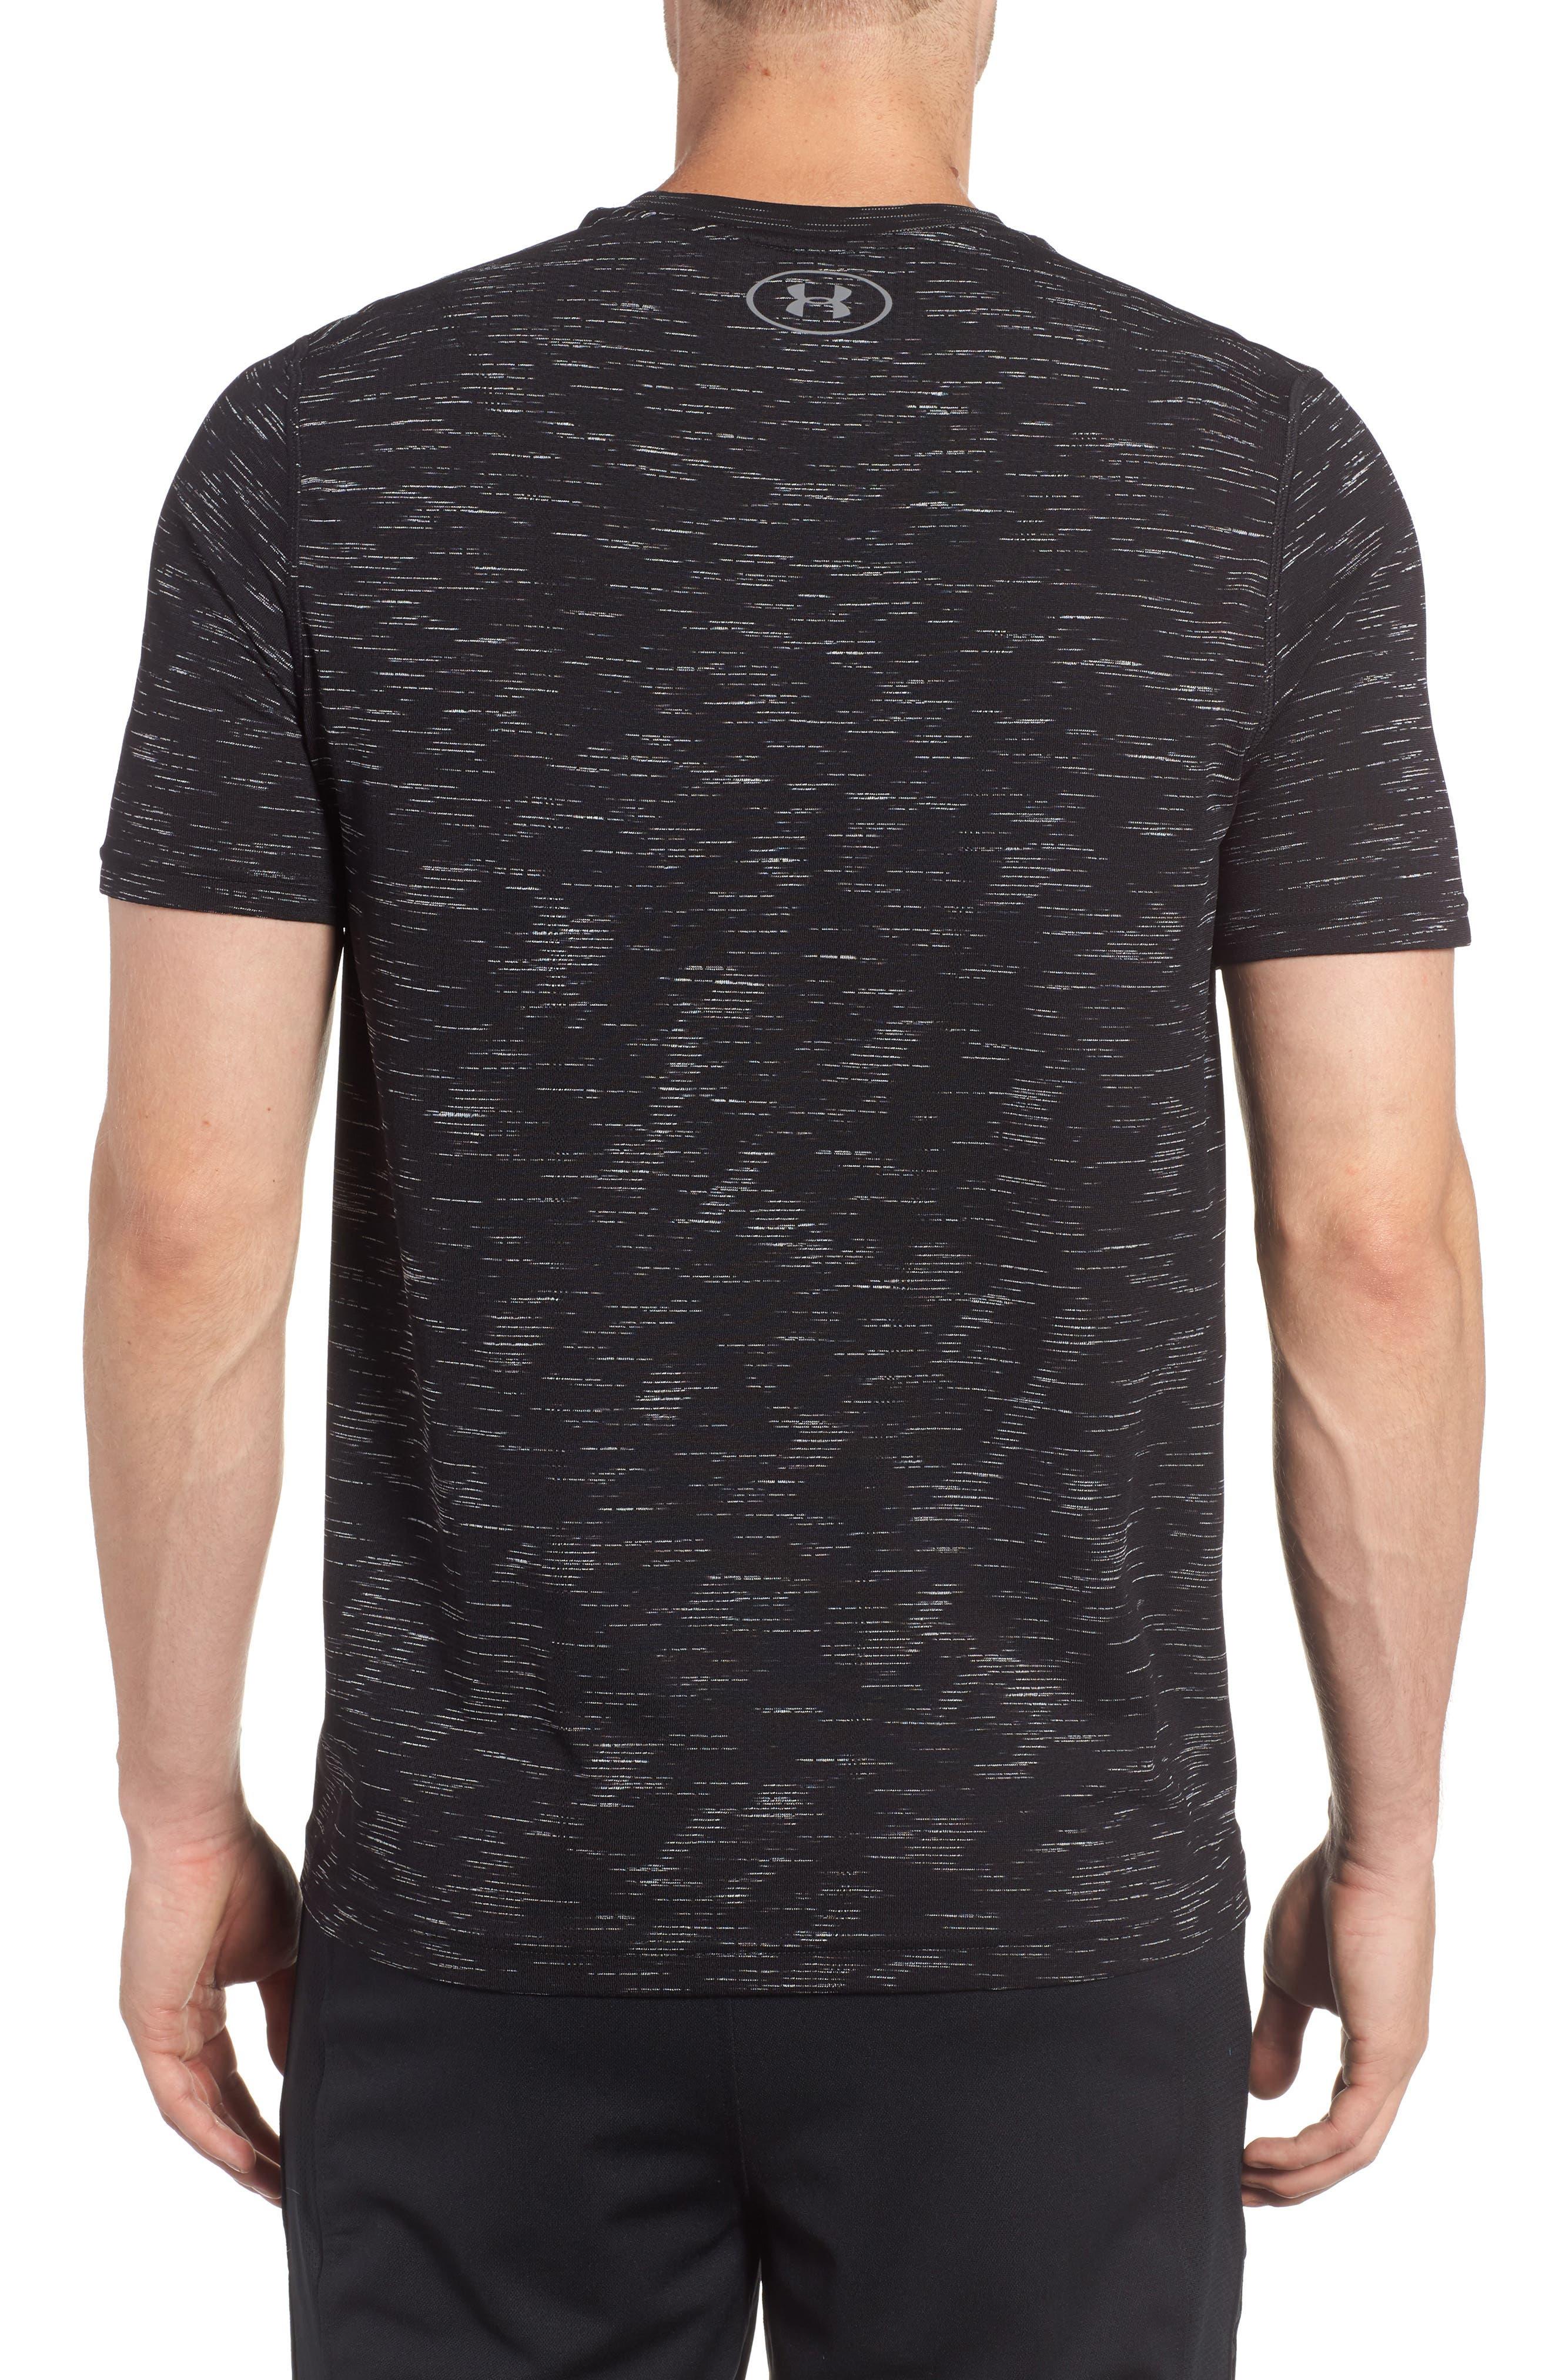 Threadborne Regular Fit T-Shirt,                             Alternate thumbnail 2, color,                             Black / Graphite